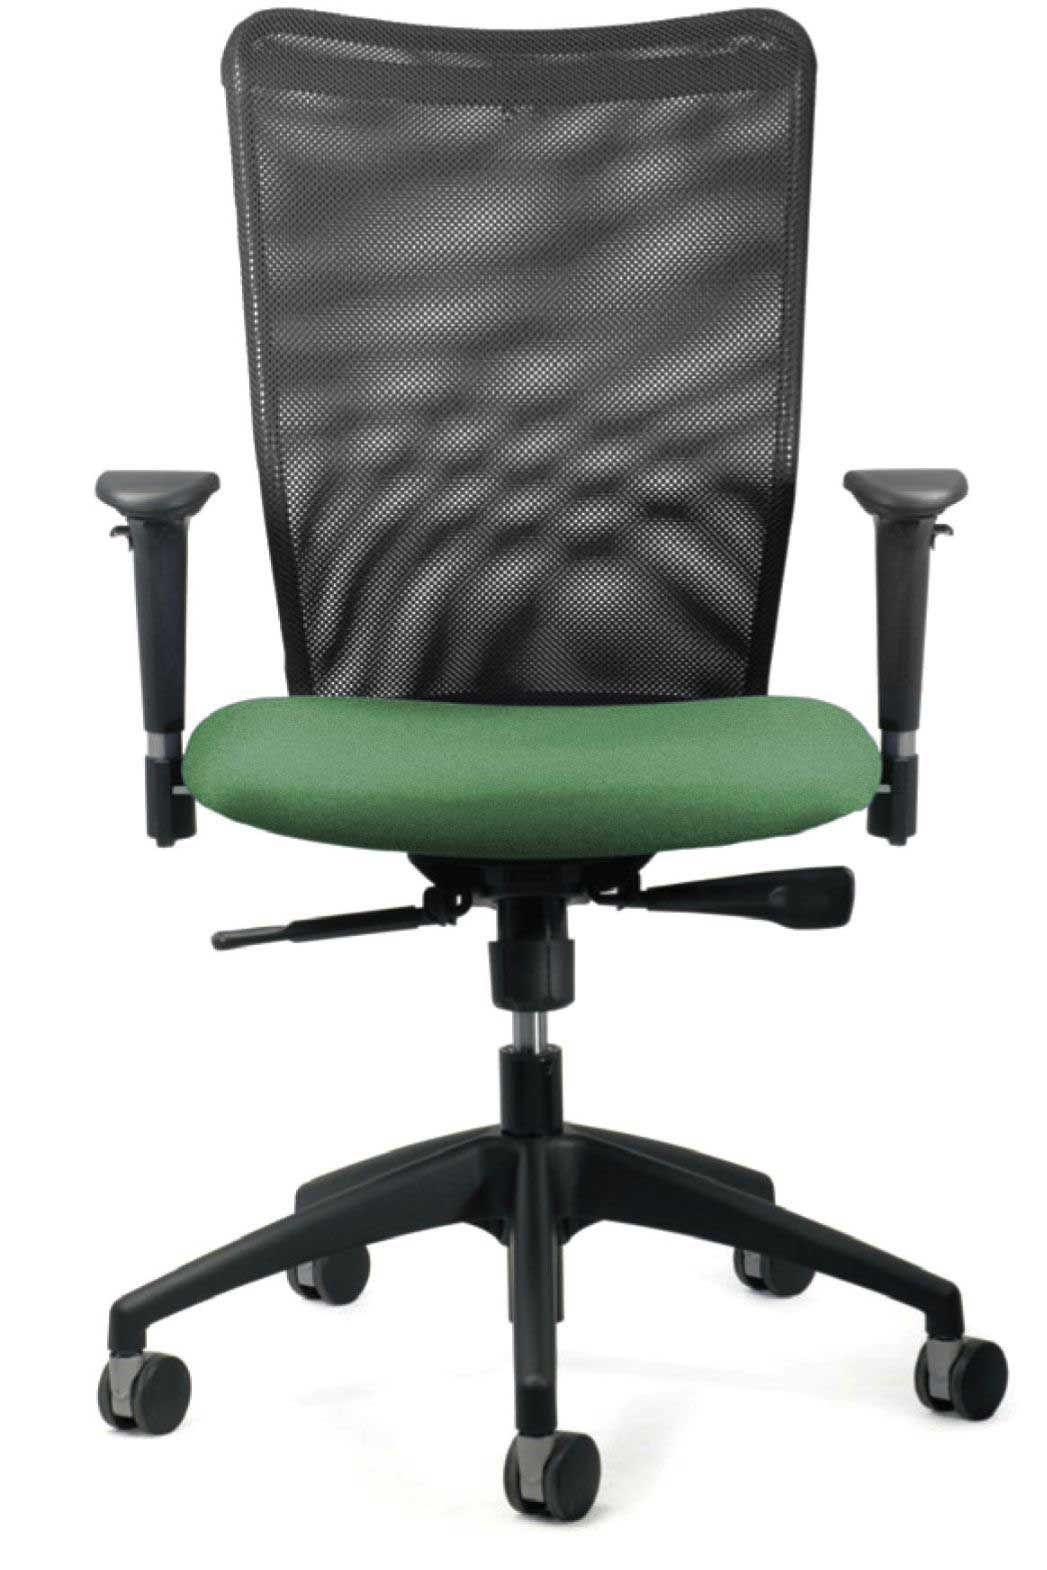 Ergonomic Mesh Office Chair With Armrest Office Chair Ergonomic